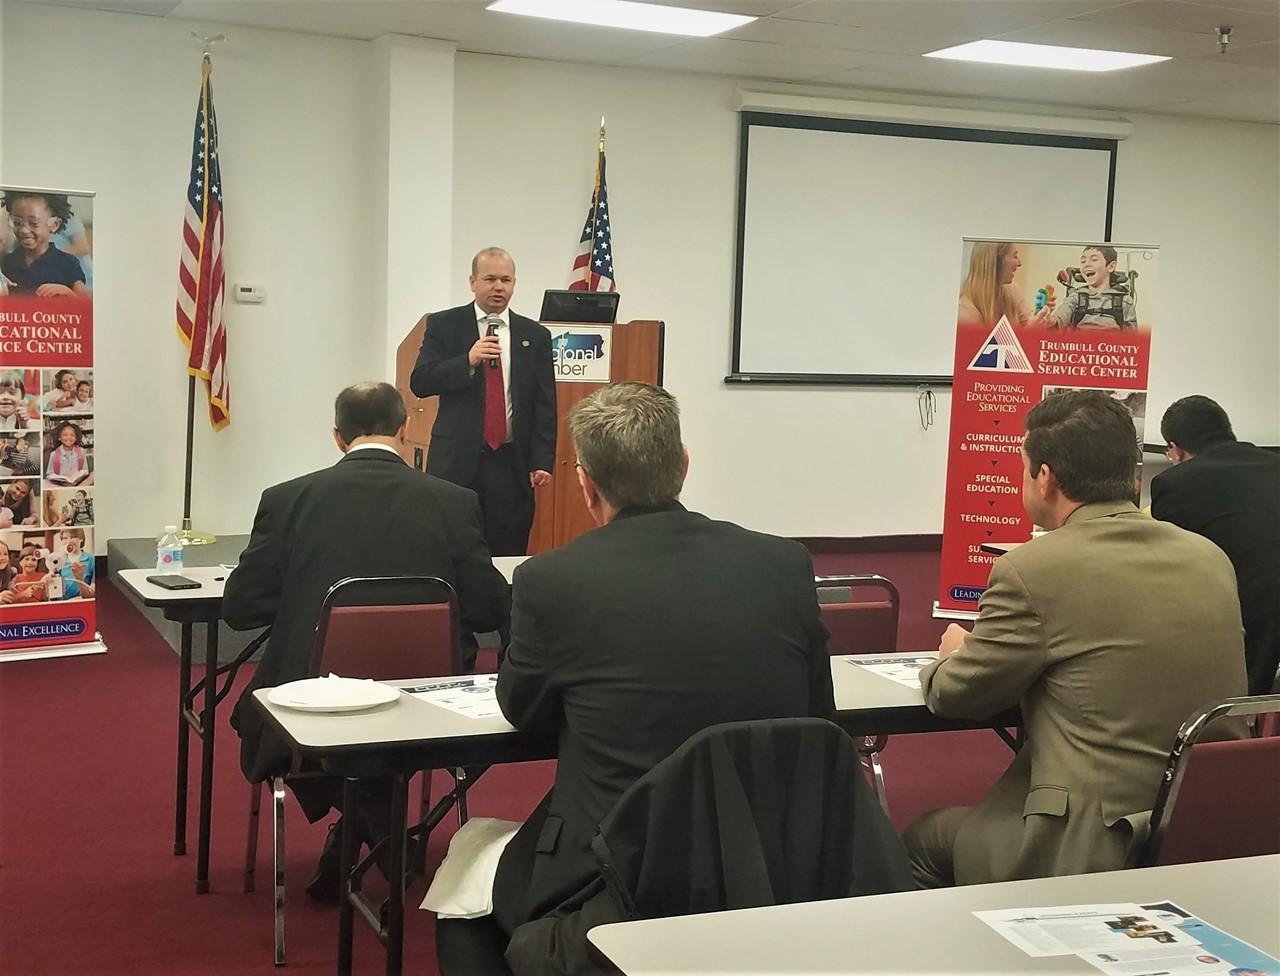 Ohio Rep. Andrew Brenner, center, discusses educational legislation & initiatives at the Regional Chamber's Lattes & Legislators event at TCESC.